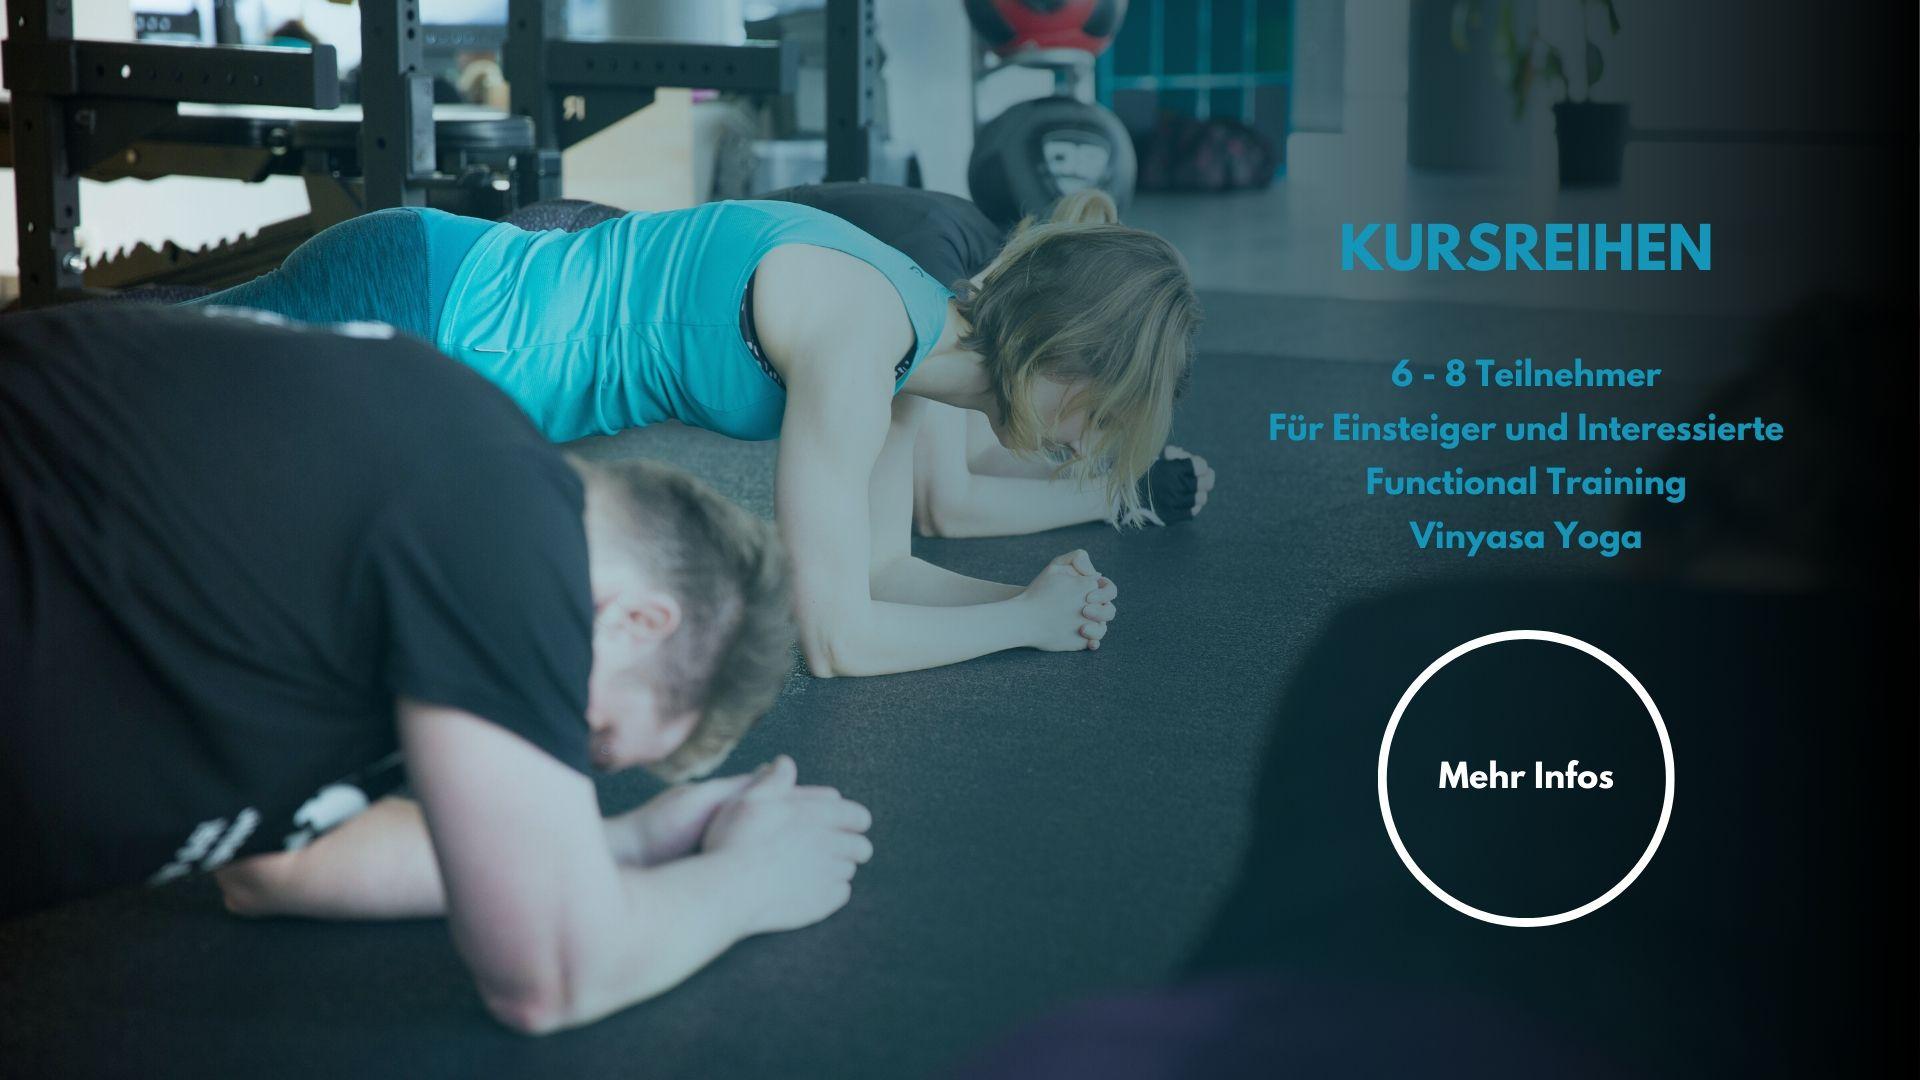 Octofit Luenen Kursreihe Functional Training Kursreihe Vinyasa Yoga